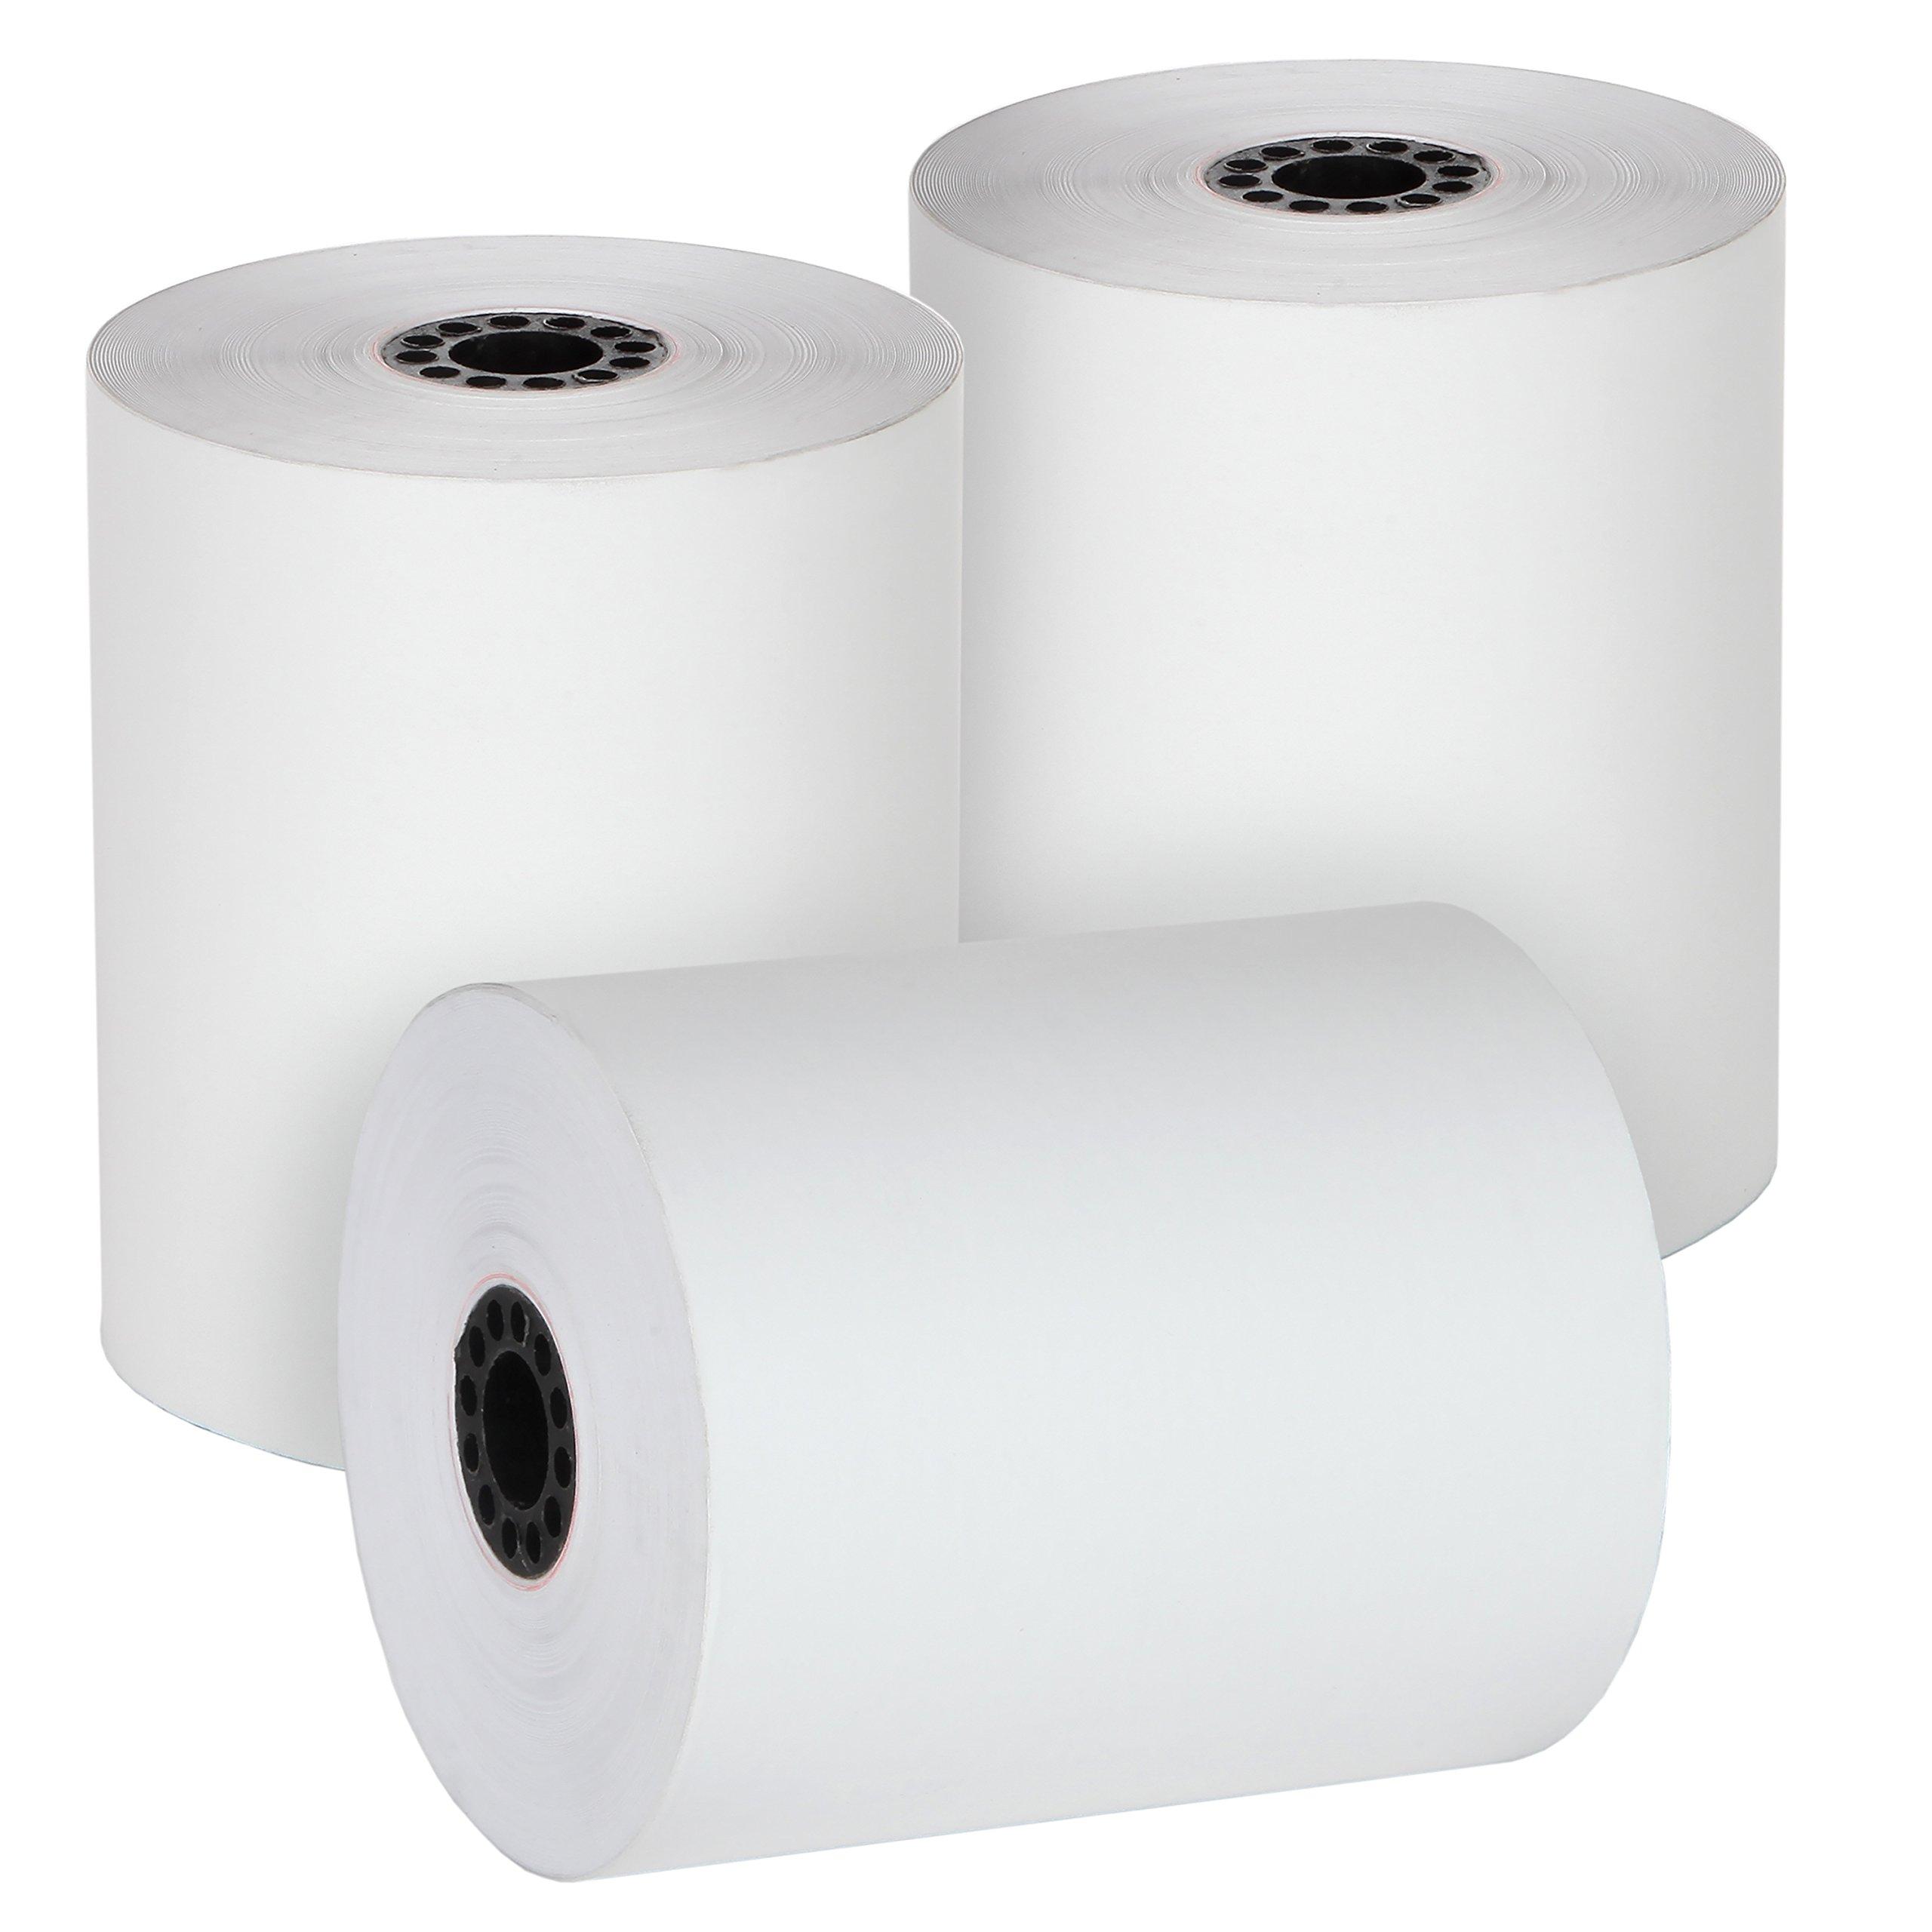 Freccia Rossa Market, Thermal Receipt Paper, 3-1/8'' X 230' POS Register Rolls - (32 Pack) by Freccia Rossa Market